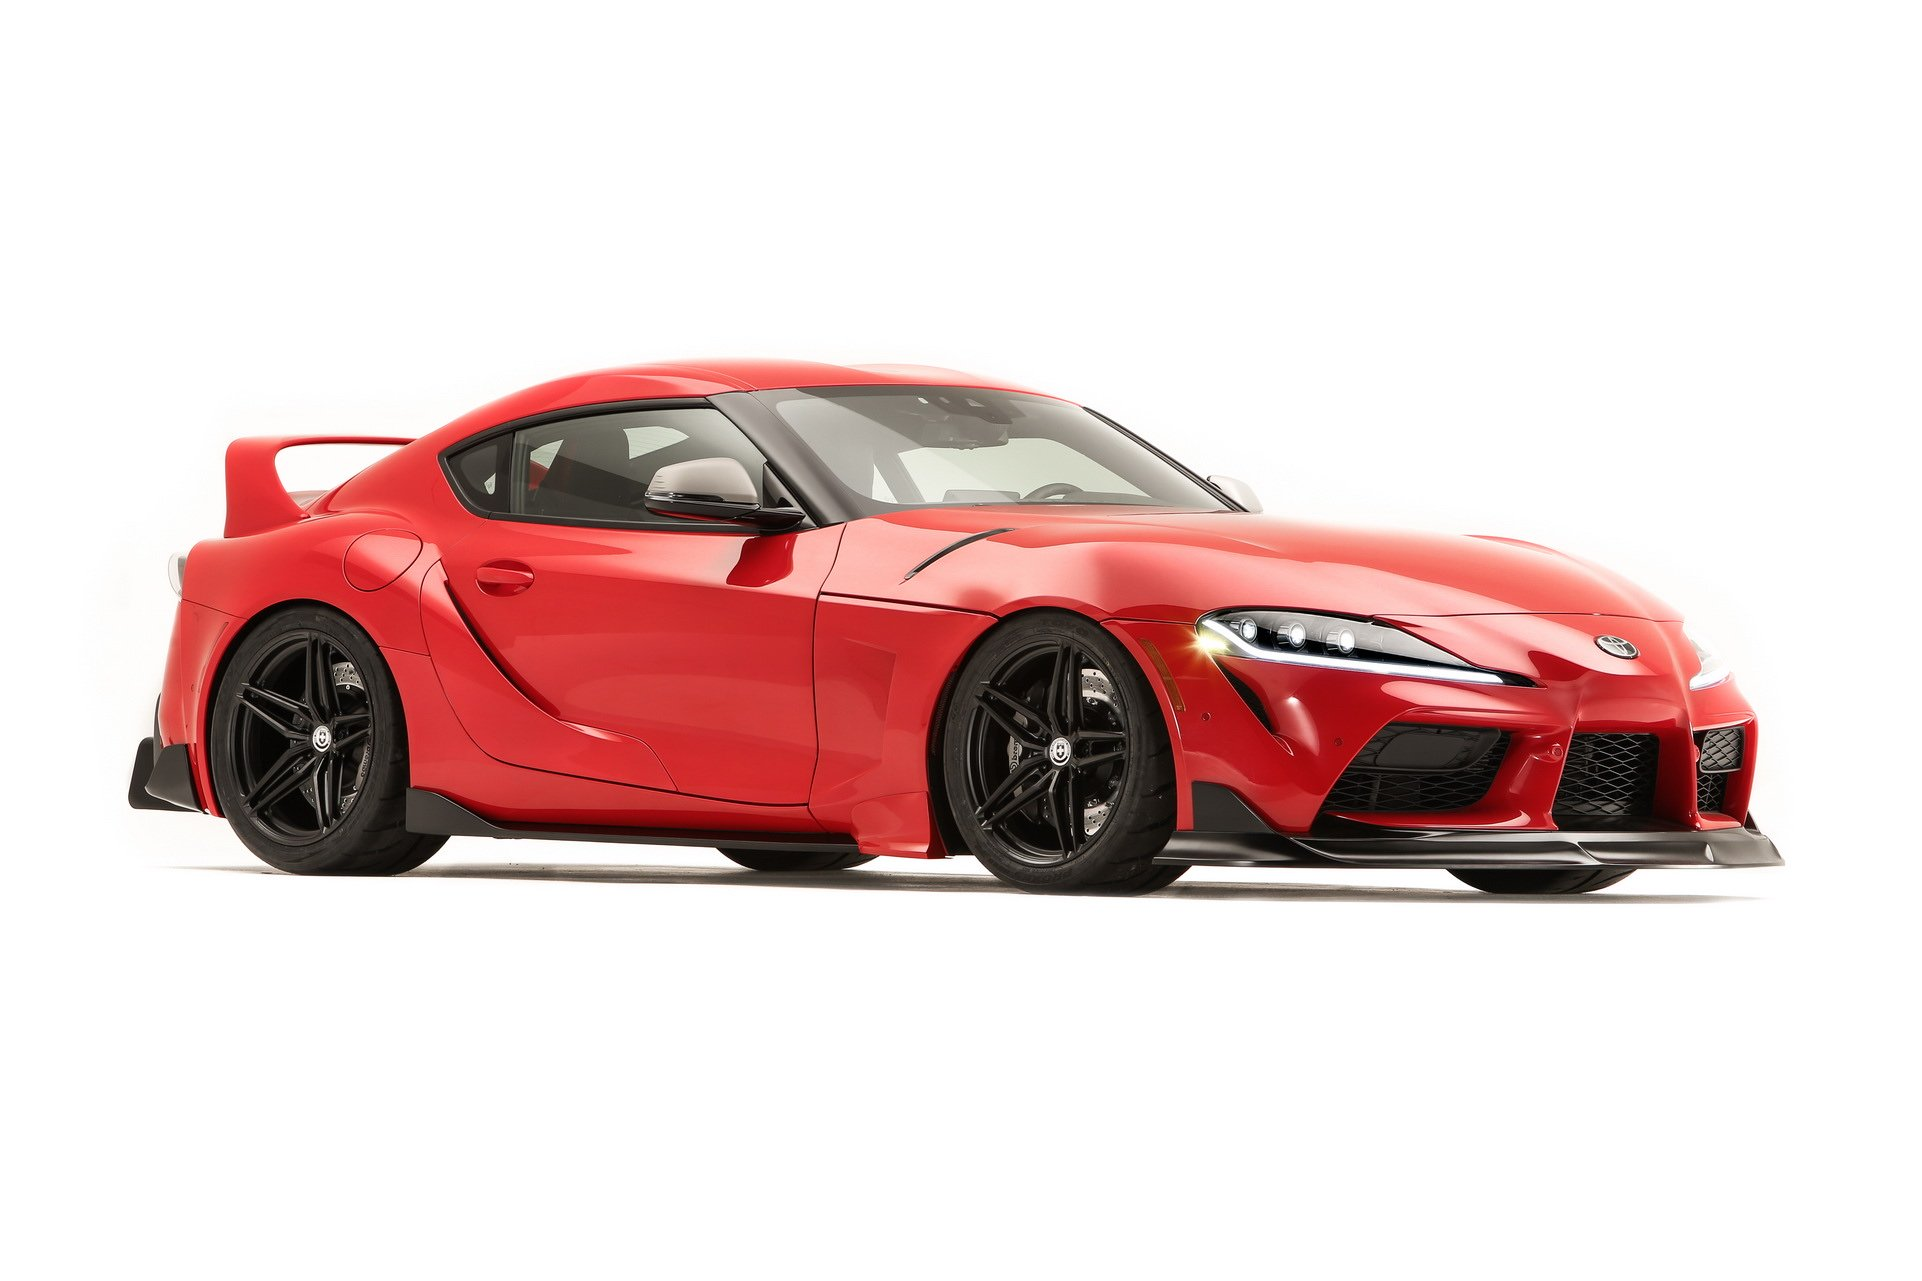 2020-Toyota-GR-Supra-Heritage-Edition-4